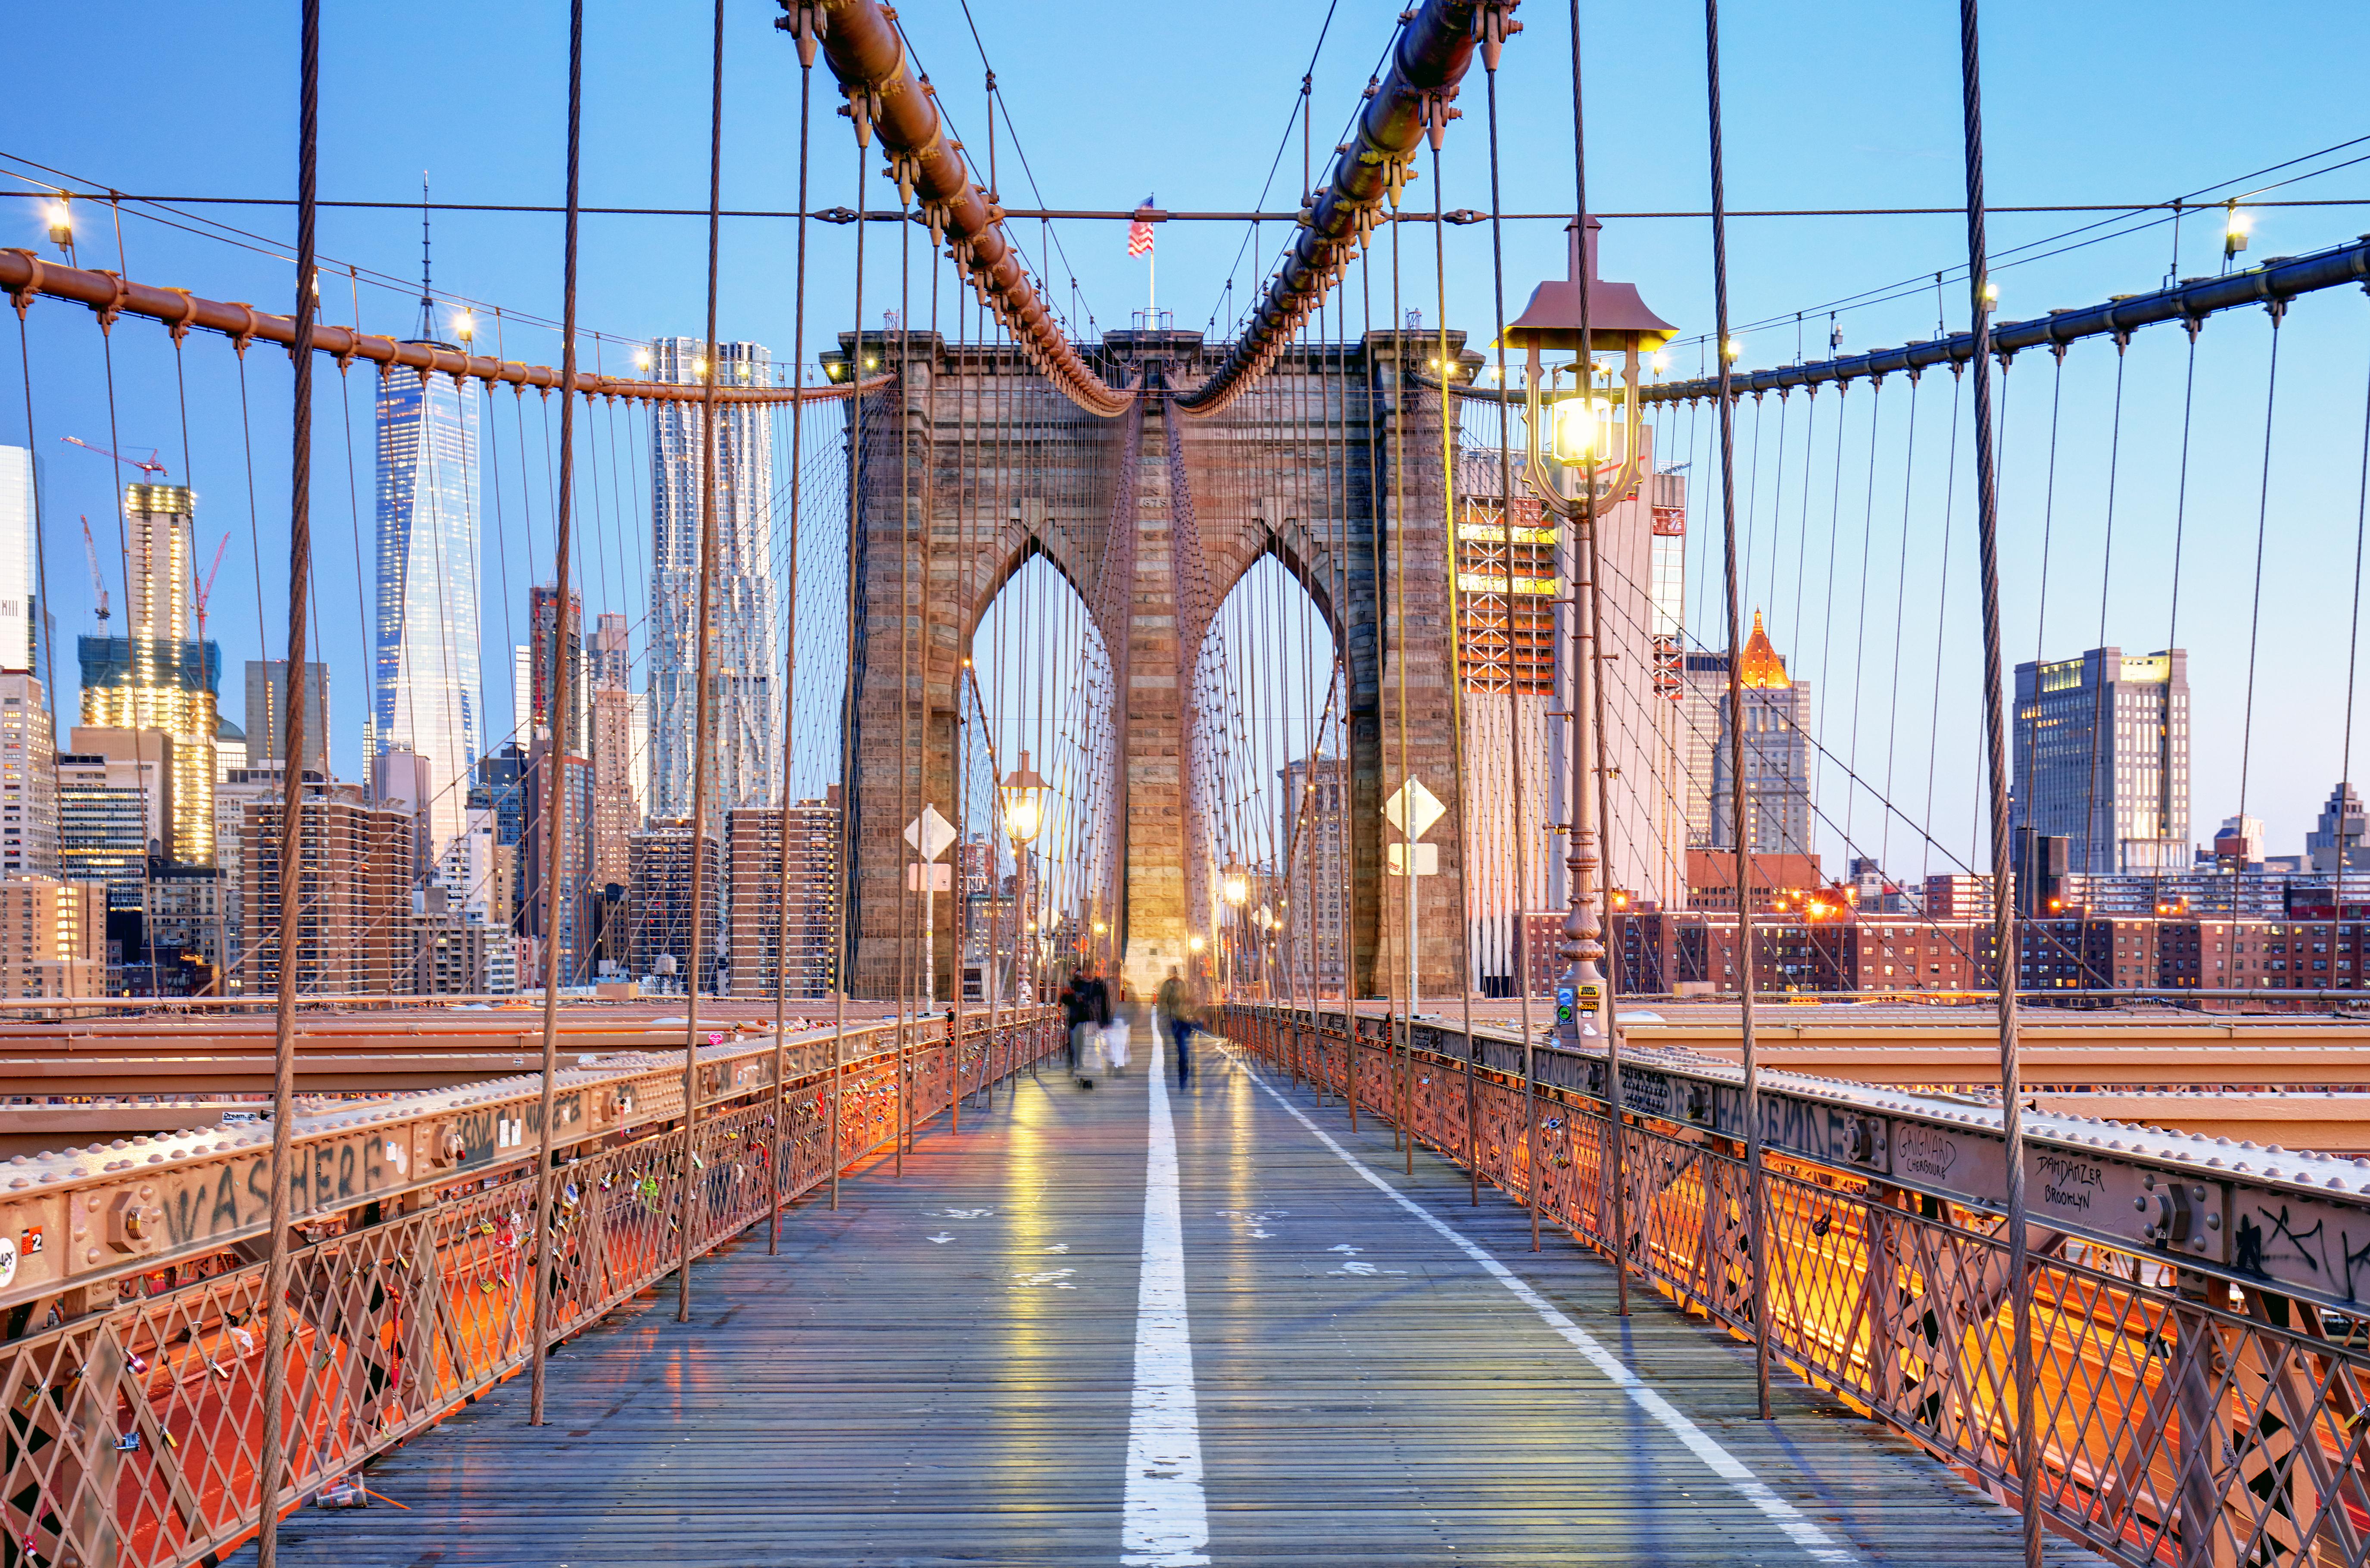 Brooklyn Bridge with a view of Manhattan